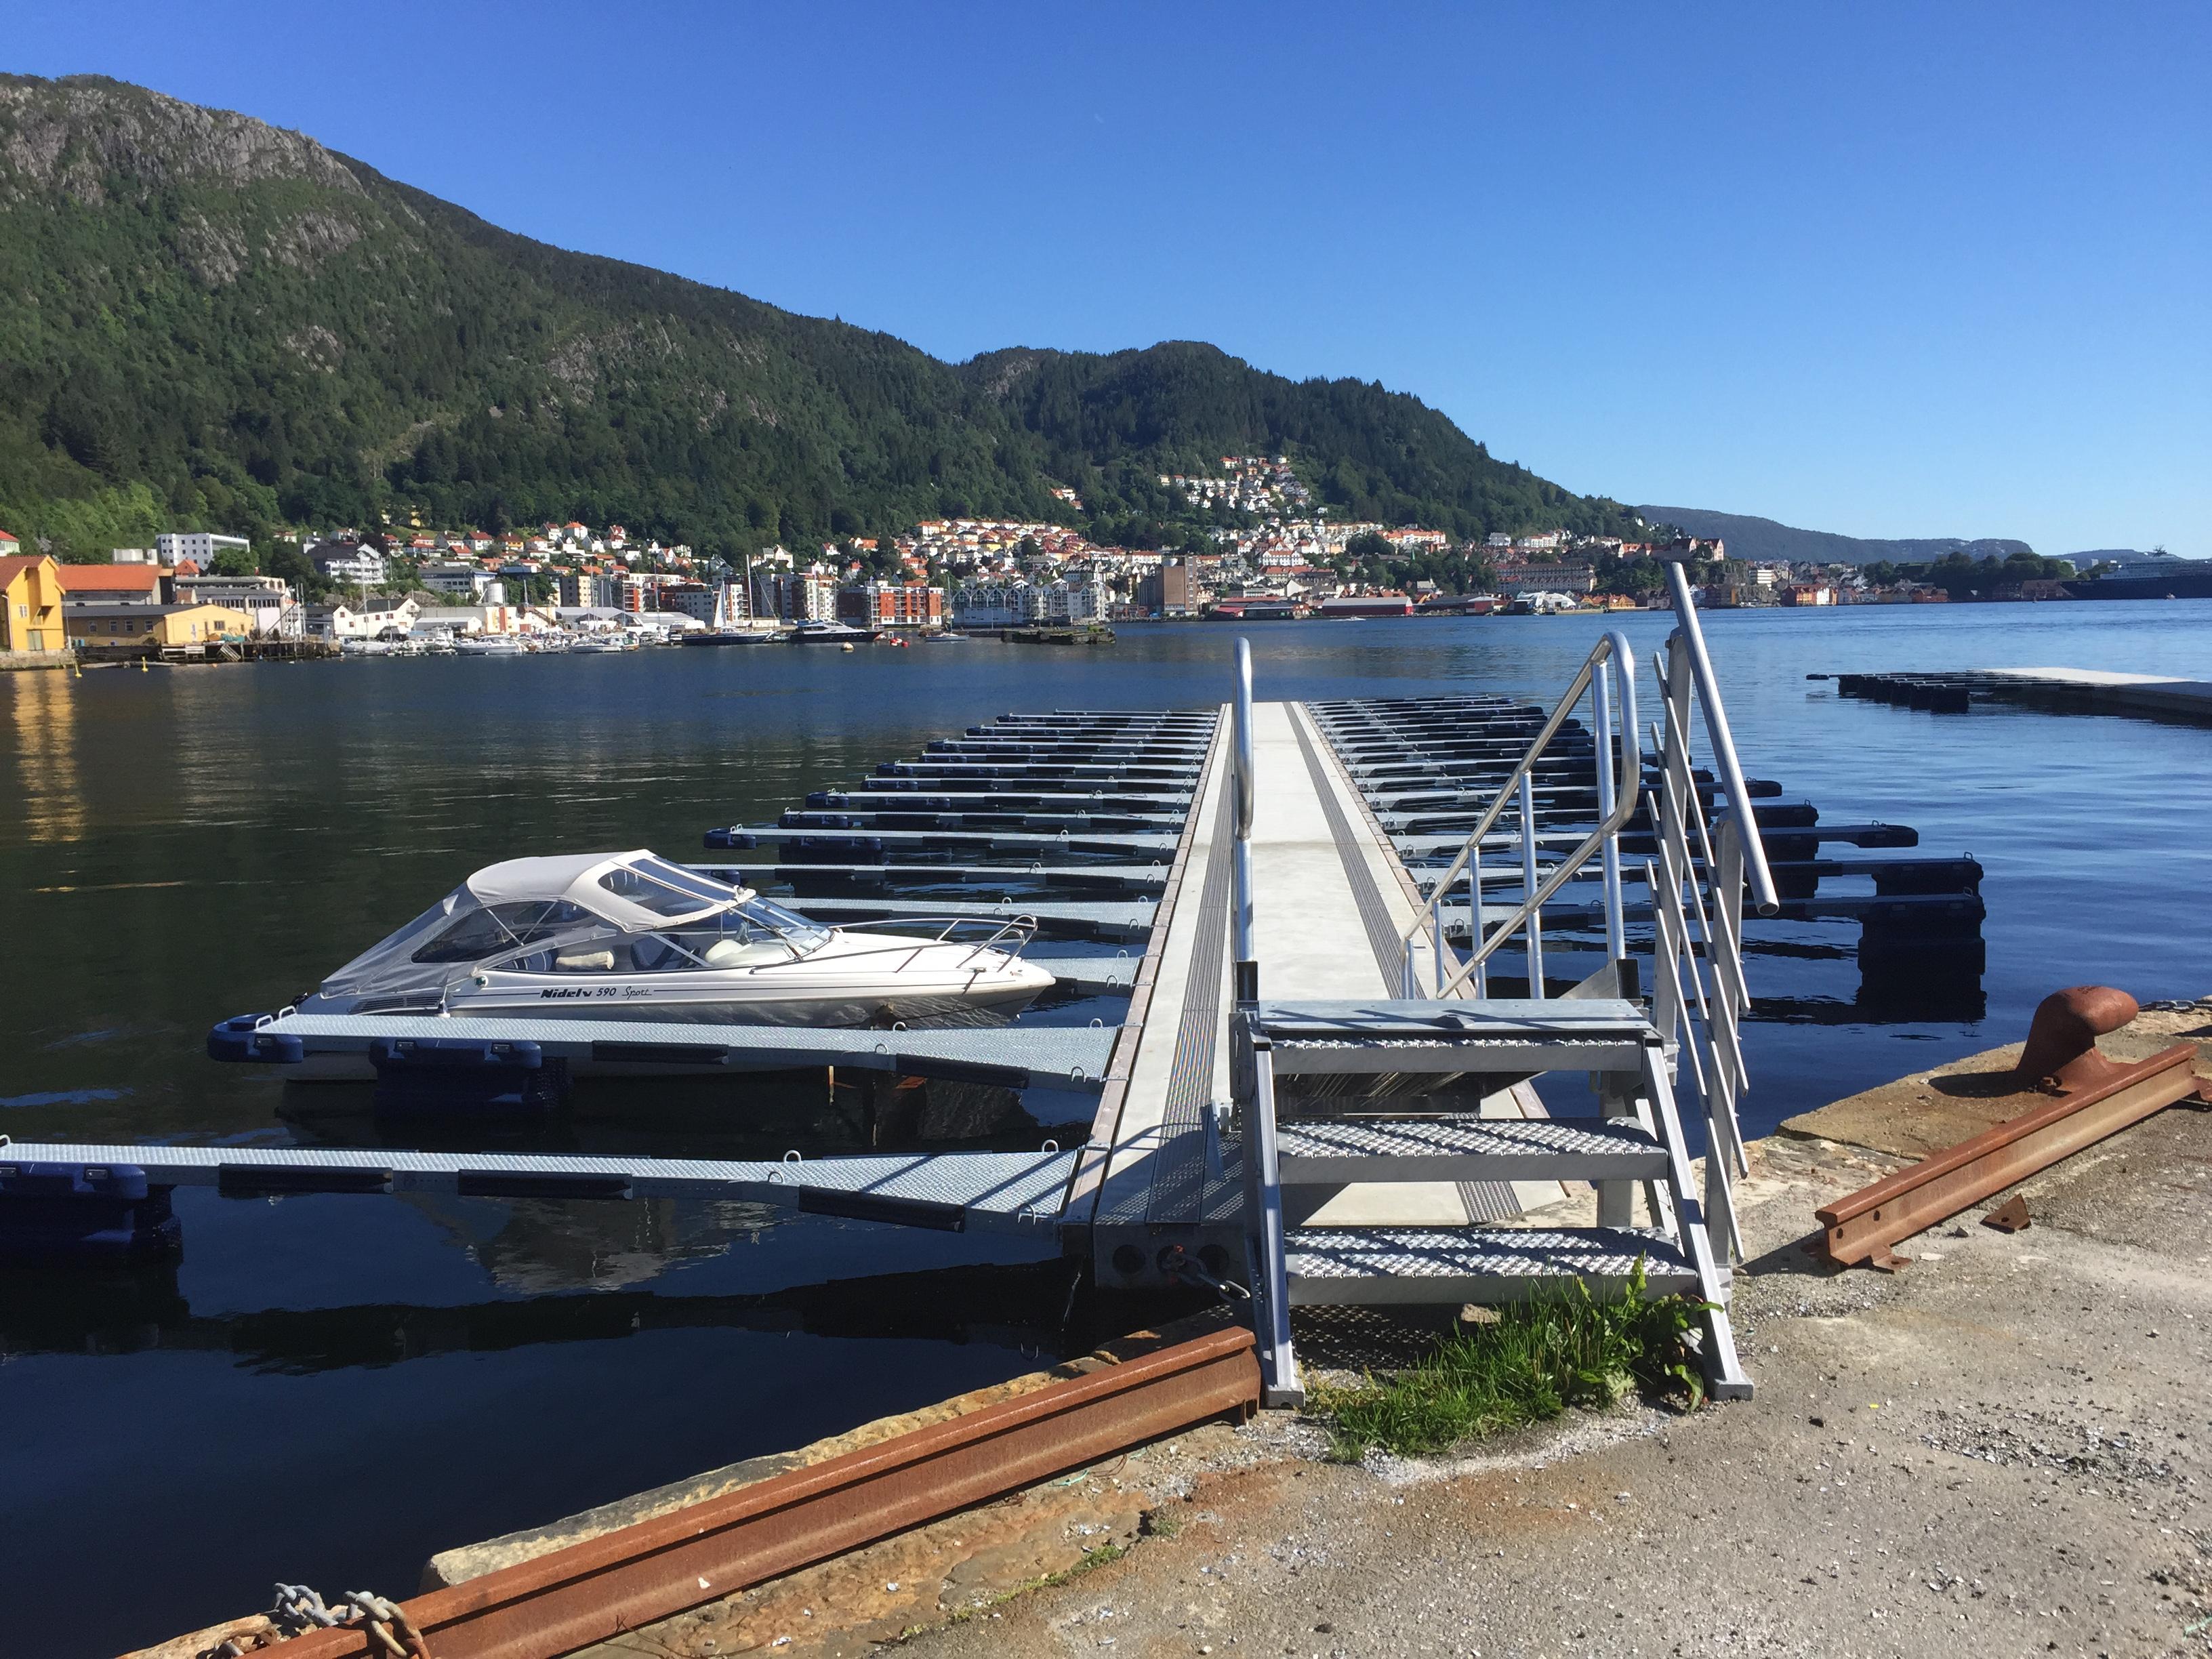 https://marinasolutions.no/uploads/Bergen-Nyhavn-Sandviken-3.JPG